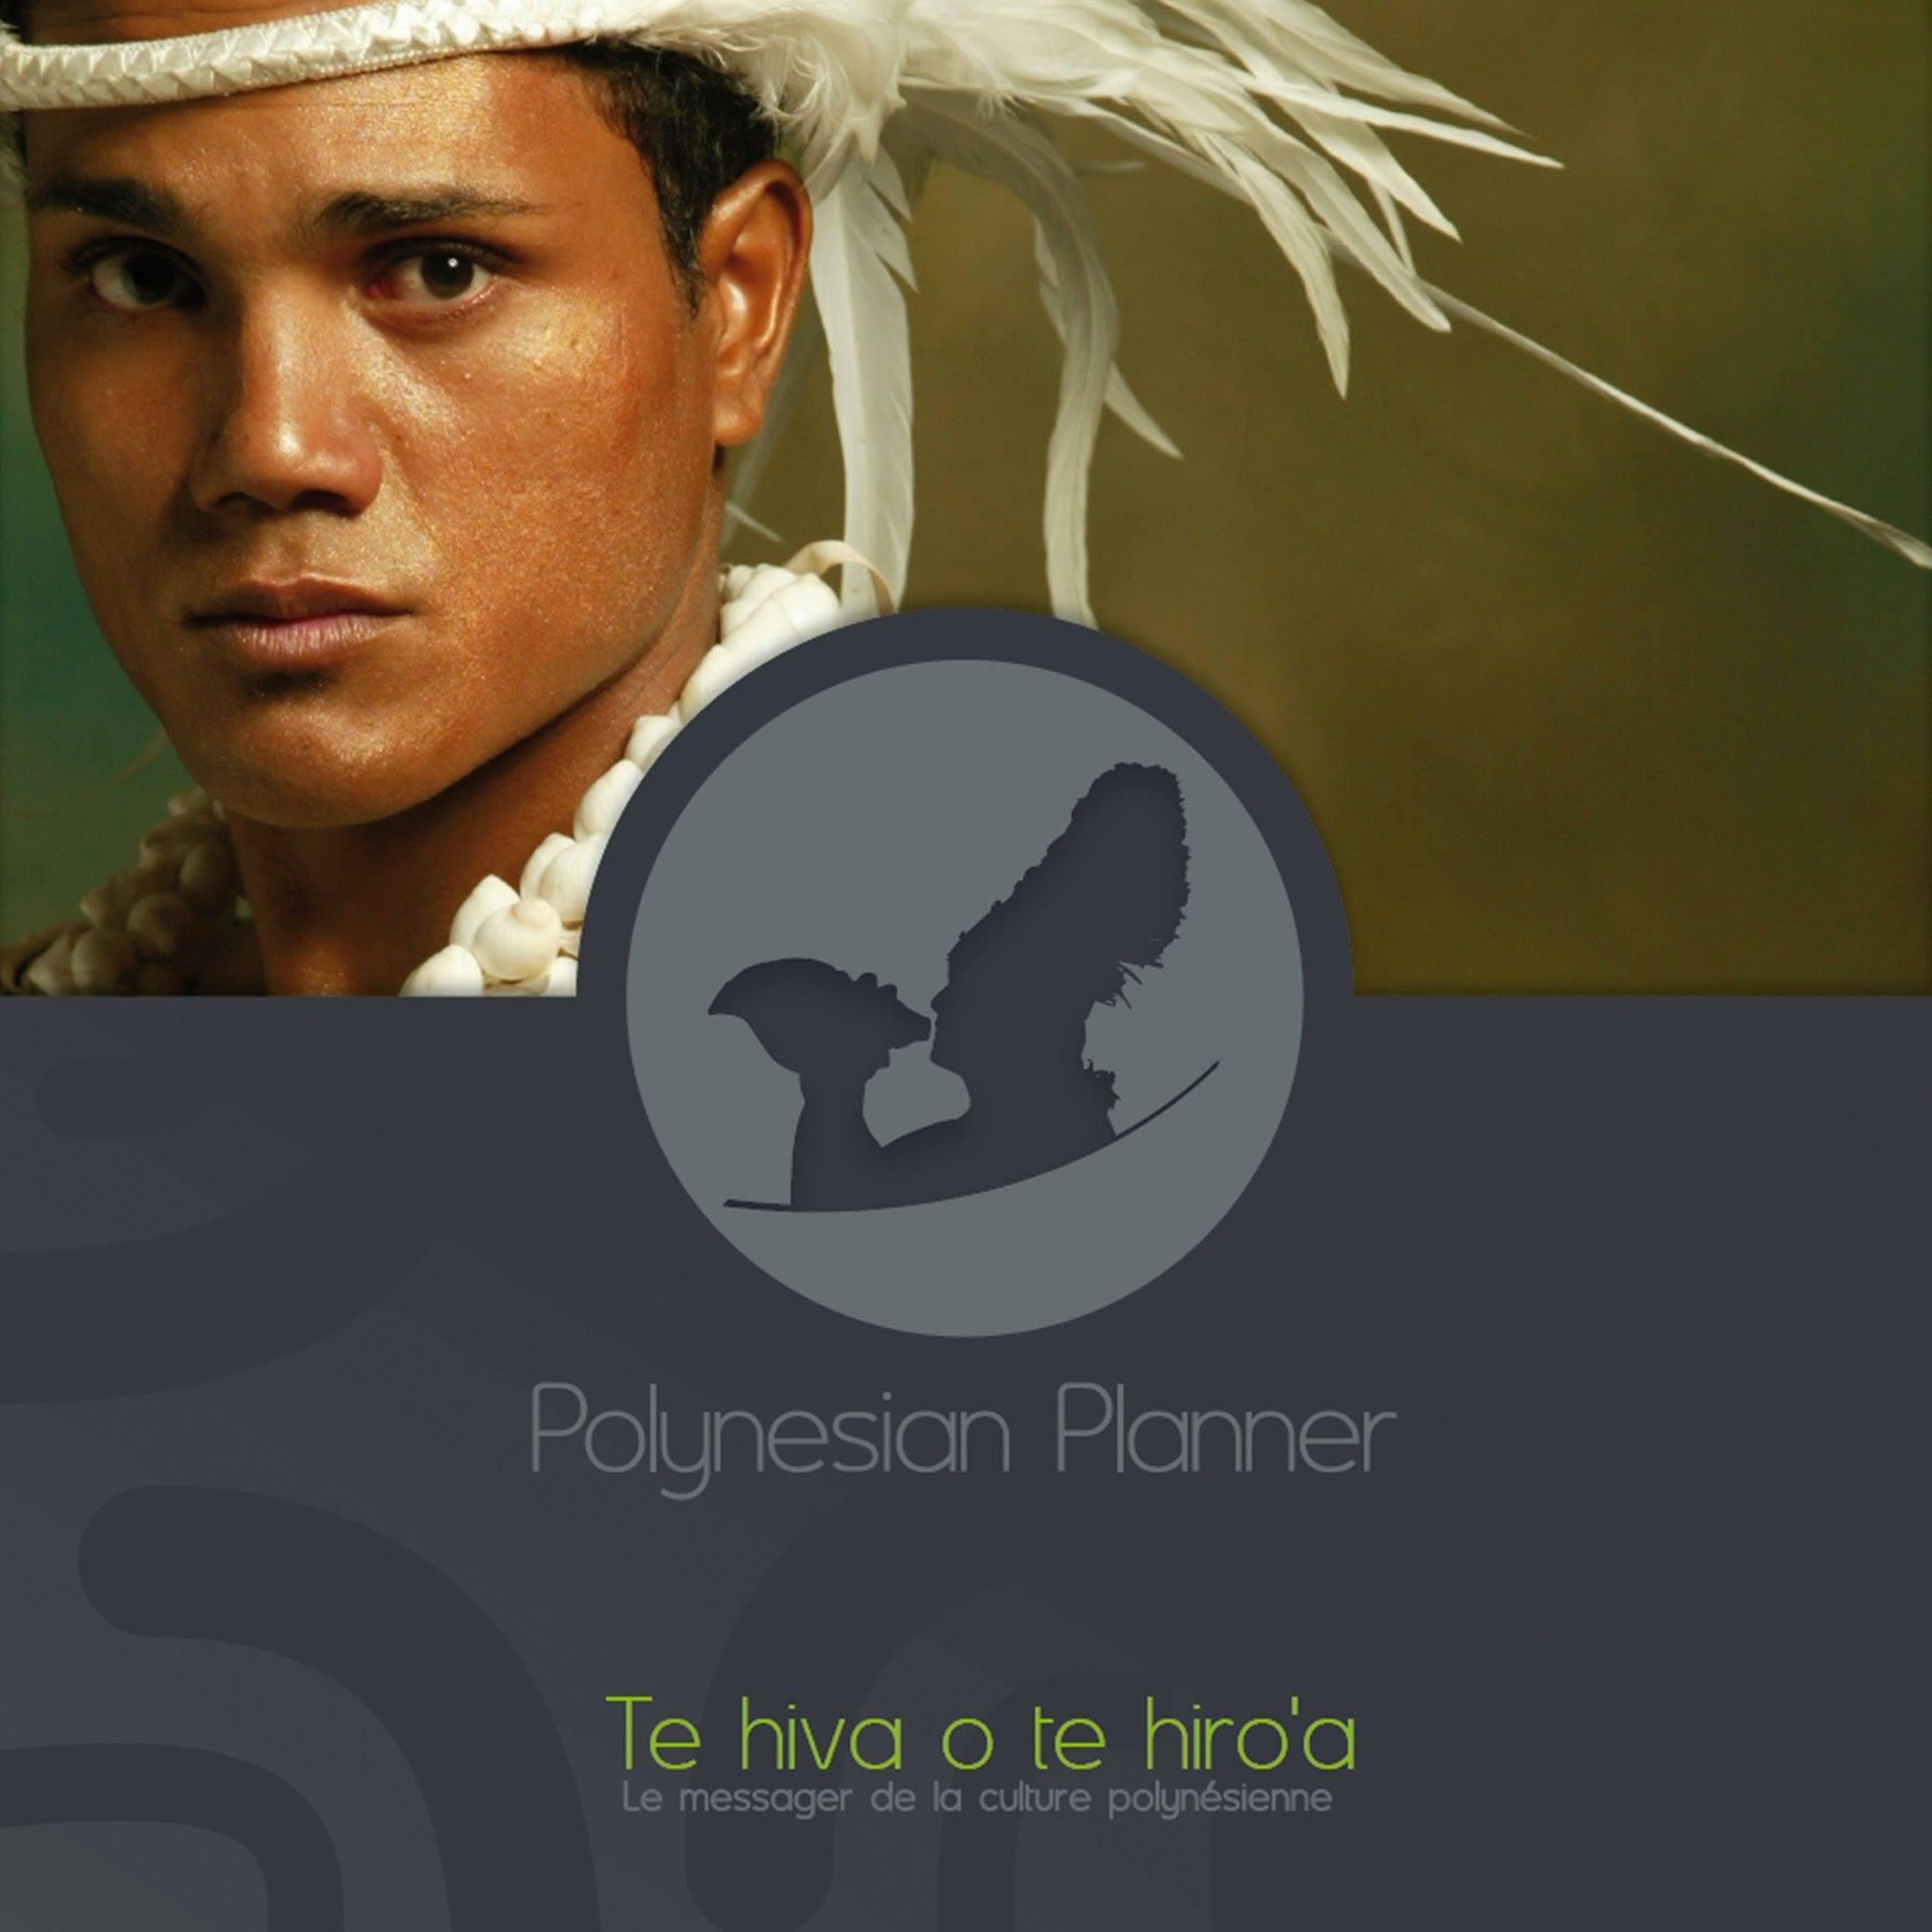 https://tahititourisme.cn/wp-content/uploads/2017/08/polynesianplannerphotodeprofil.jpg